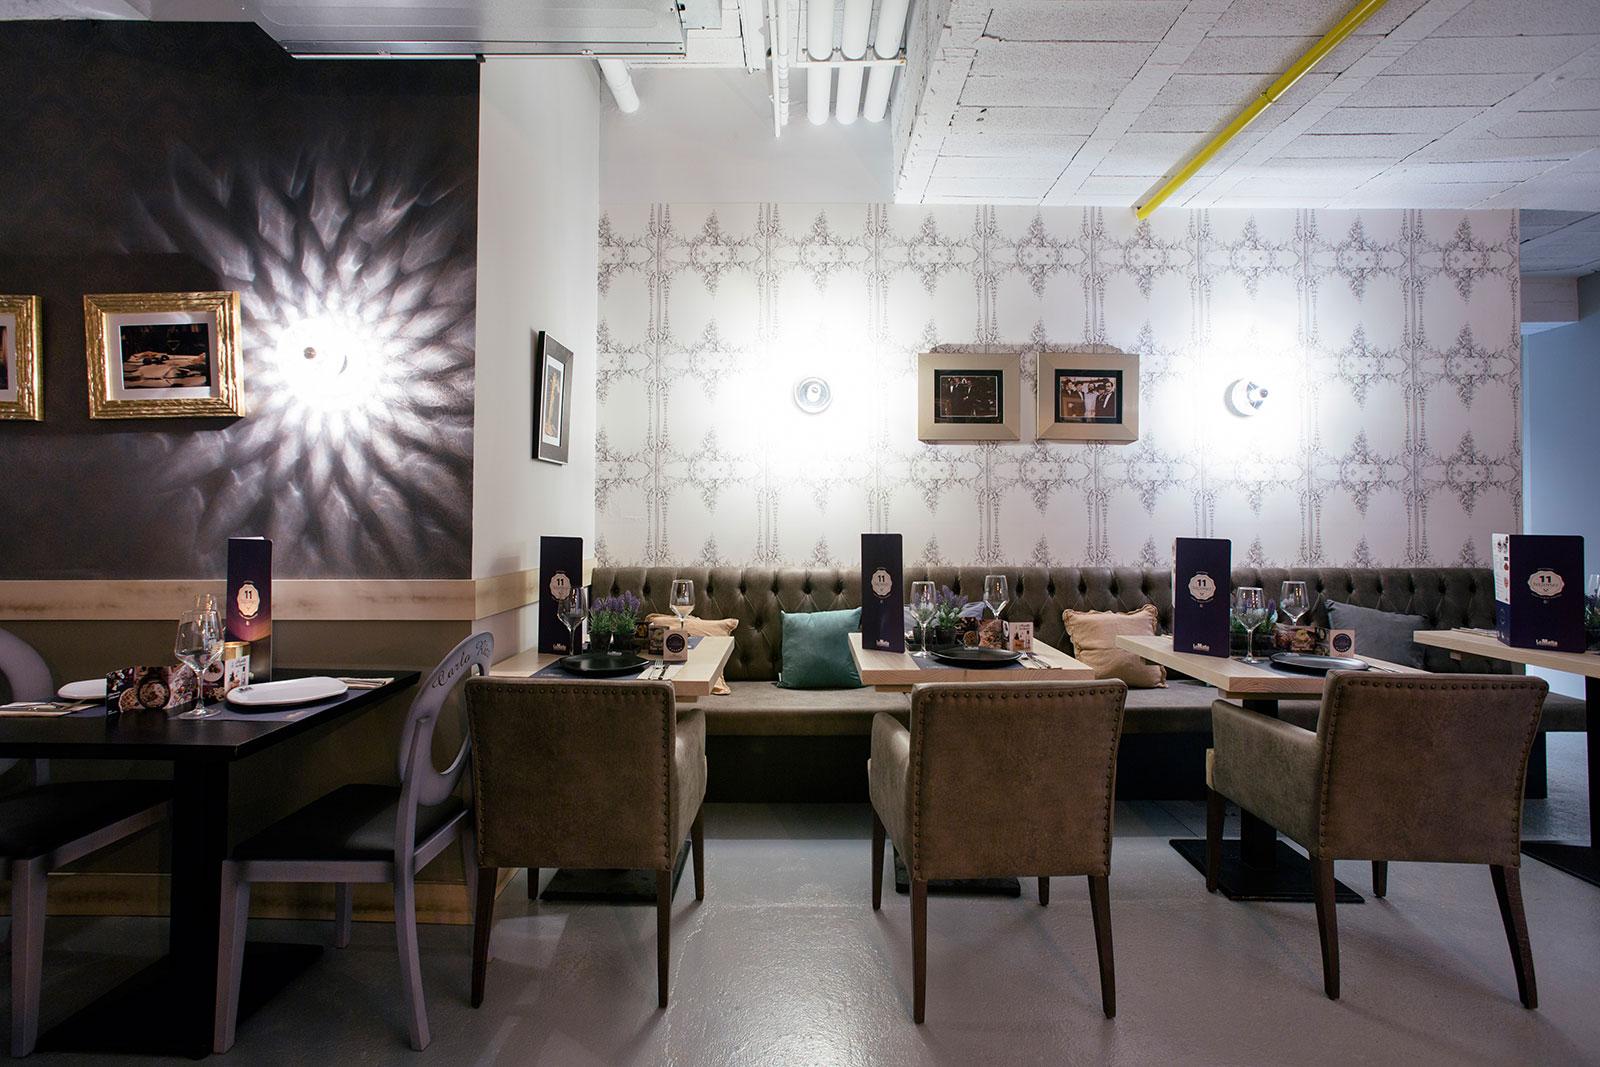 IK7A5033 - La Mafia se sienta a la mesa no para de crecer. Abre restaurante en San Sebastian